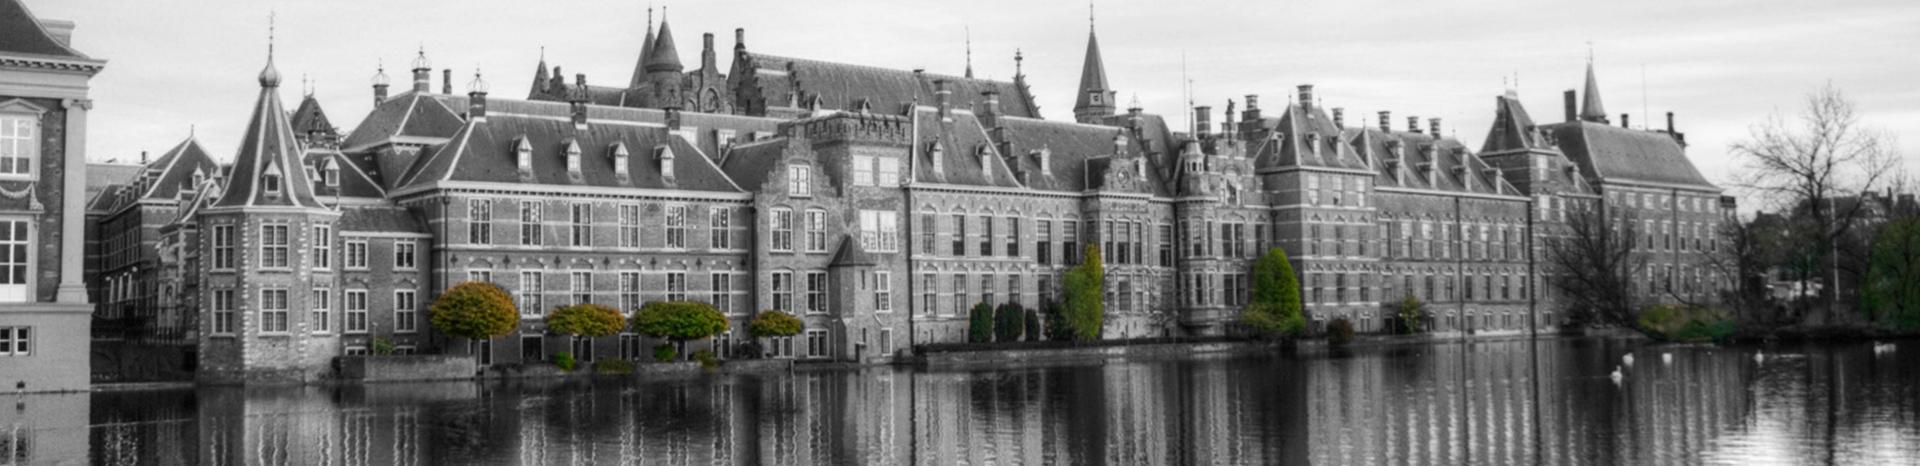 Letselschade advocaat Den Haag | LetselPro